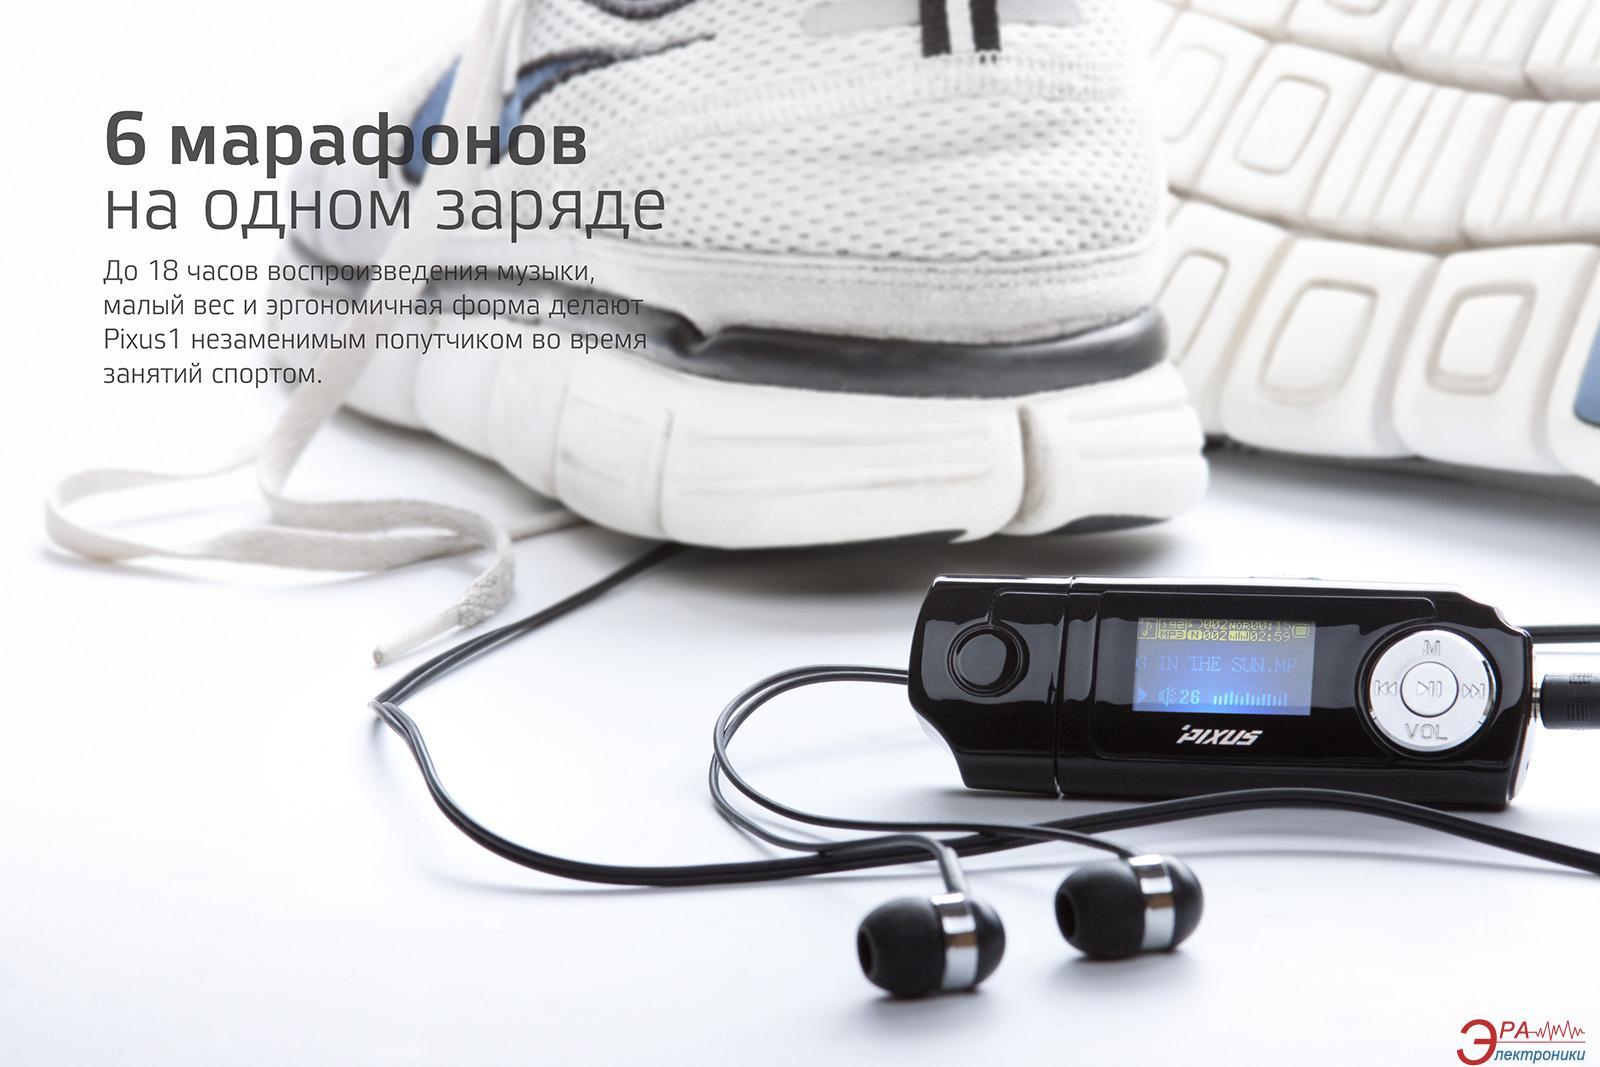 MP3 плеер Pixus One 4 Gb Black